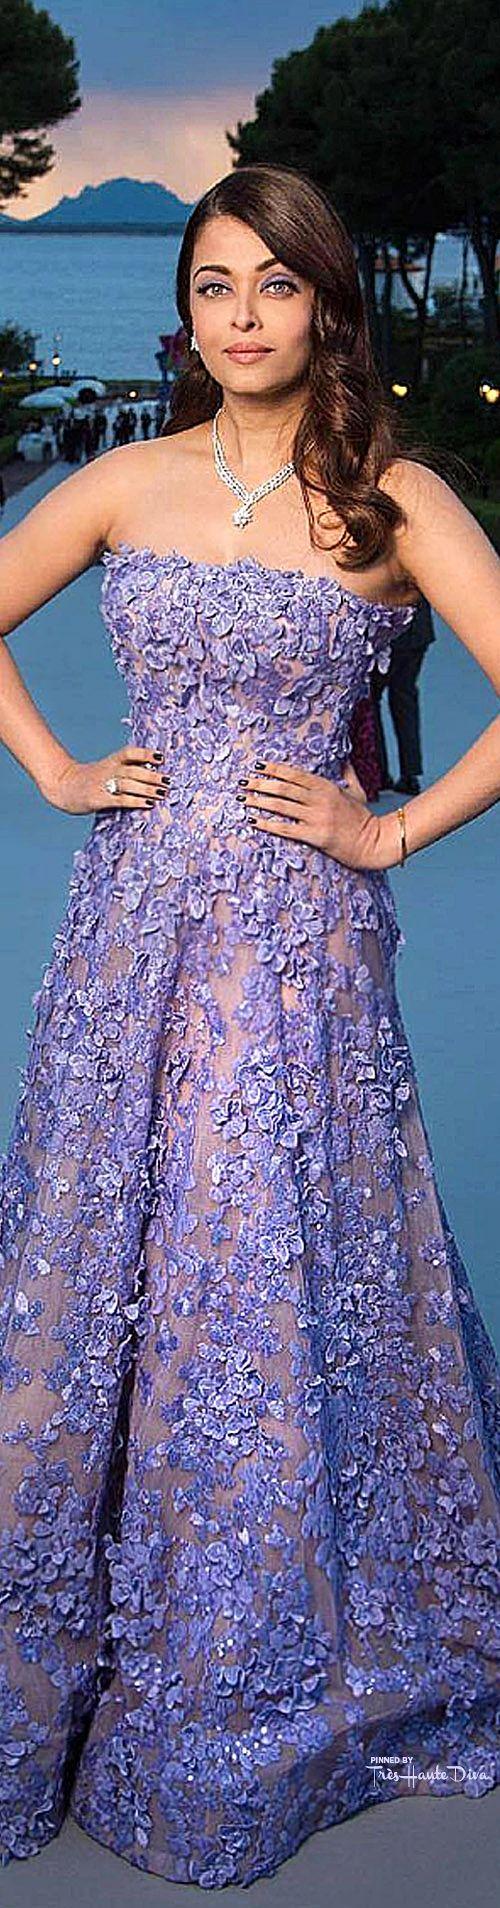 #Aishwarya #Rai Bachchan in Elie Saab Couture ♔ Cannes Film Festival 2015 Red Carpet ♔ Très Haute Diva ♔